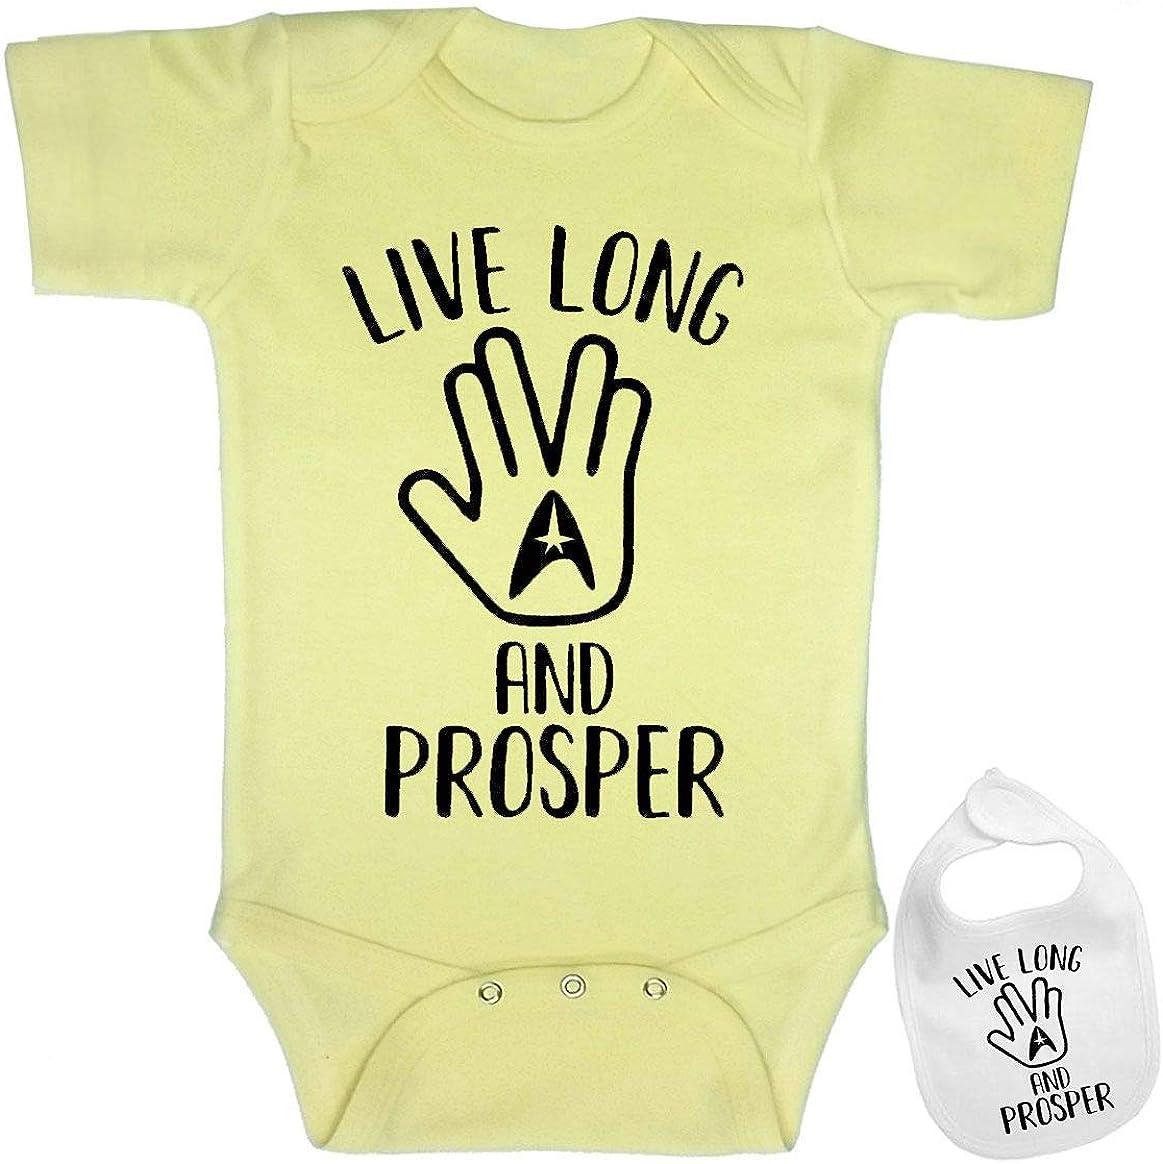 Cute Nerdy Saying Funny Shirt Baby Bodysuit Outfit Onesie /& Bib Star Trek Spock